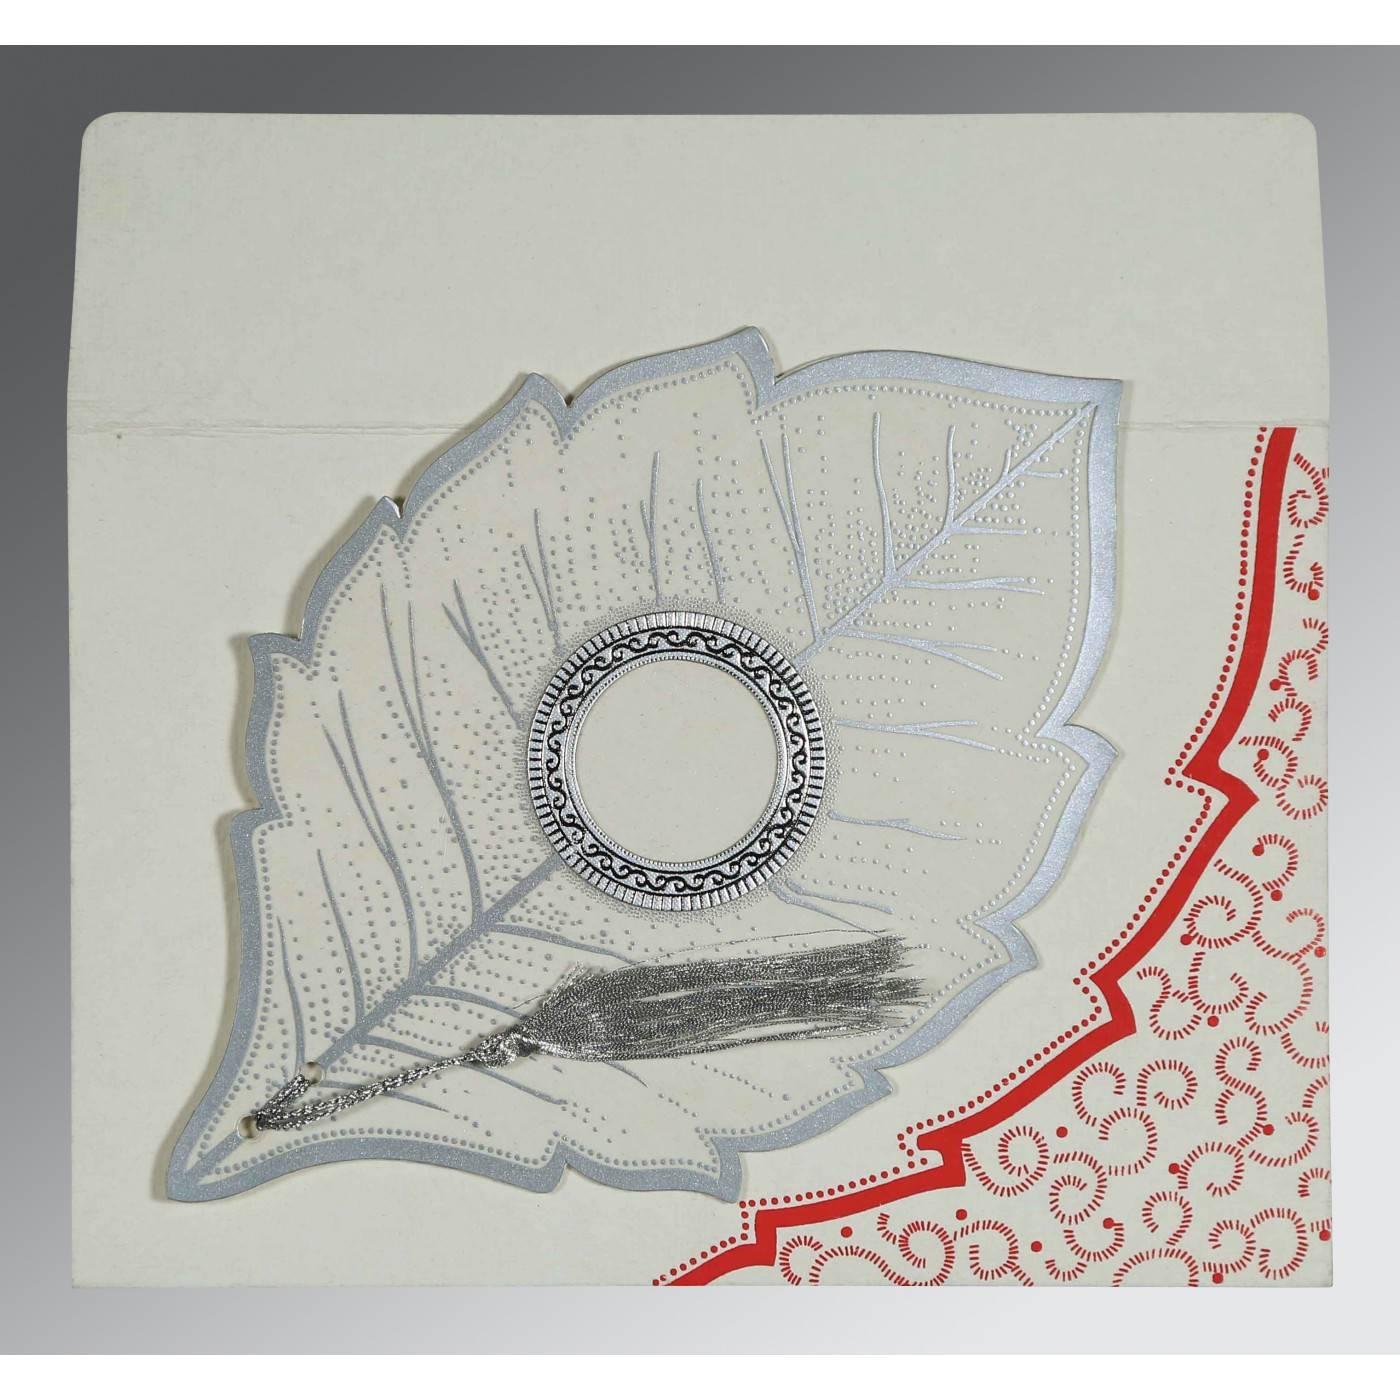 BEIGE HANDMADE COTTON FLORAL THEMED - FOIL STAMPED WEDDING CARD : CRU-8219L - IndianWeddingCards